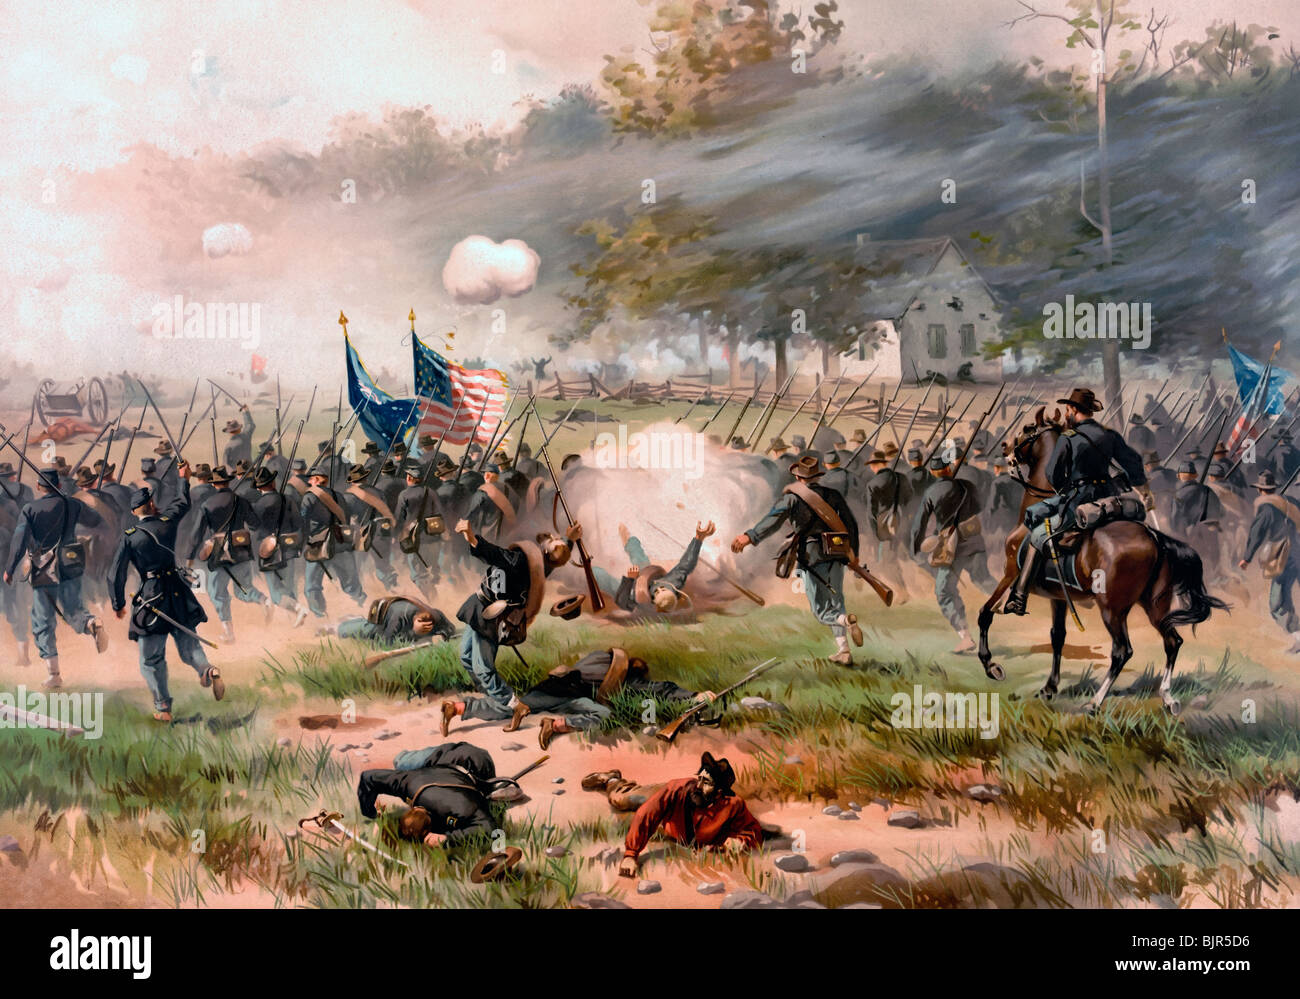 Batalla de Antietam o Sharpsburg, combatió el 17 de septiembre de 1862, durante la Guerra Civil de EE.UU. Imagen De Stock